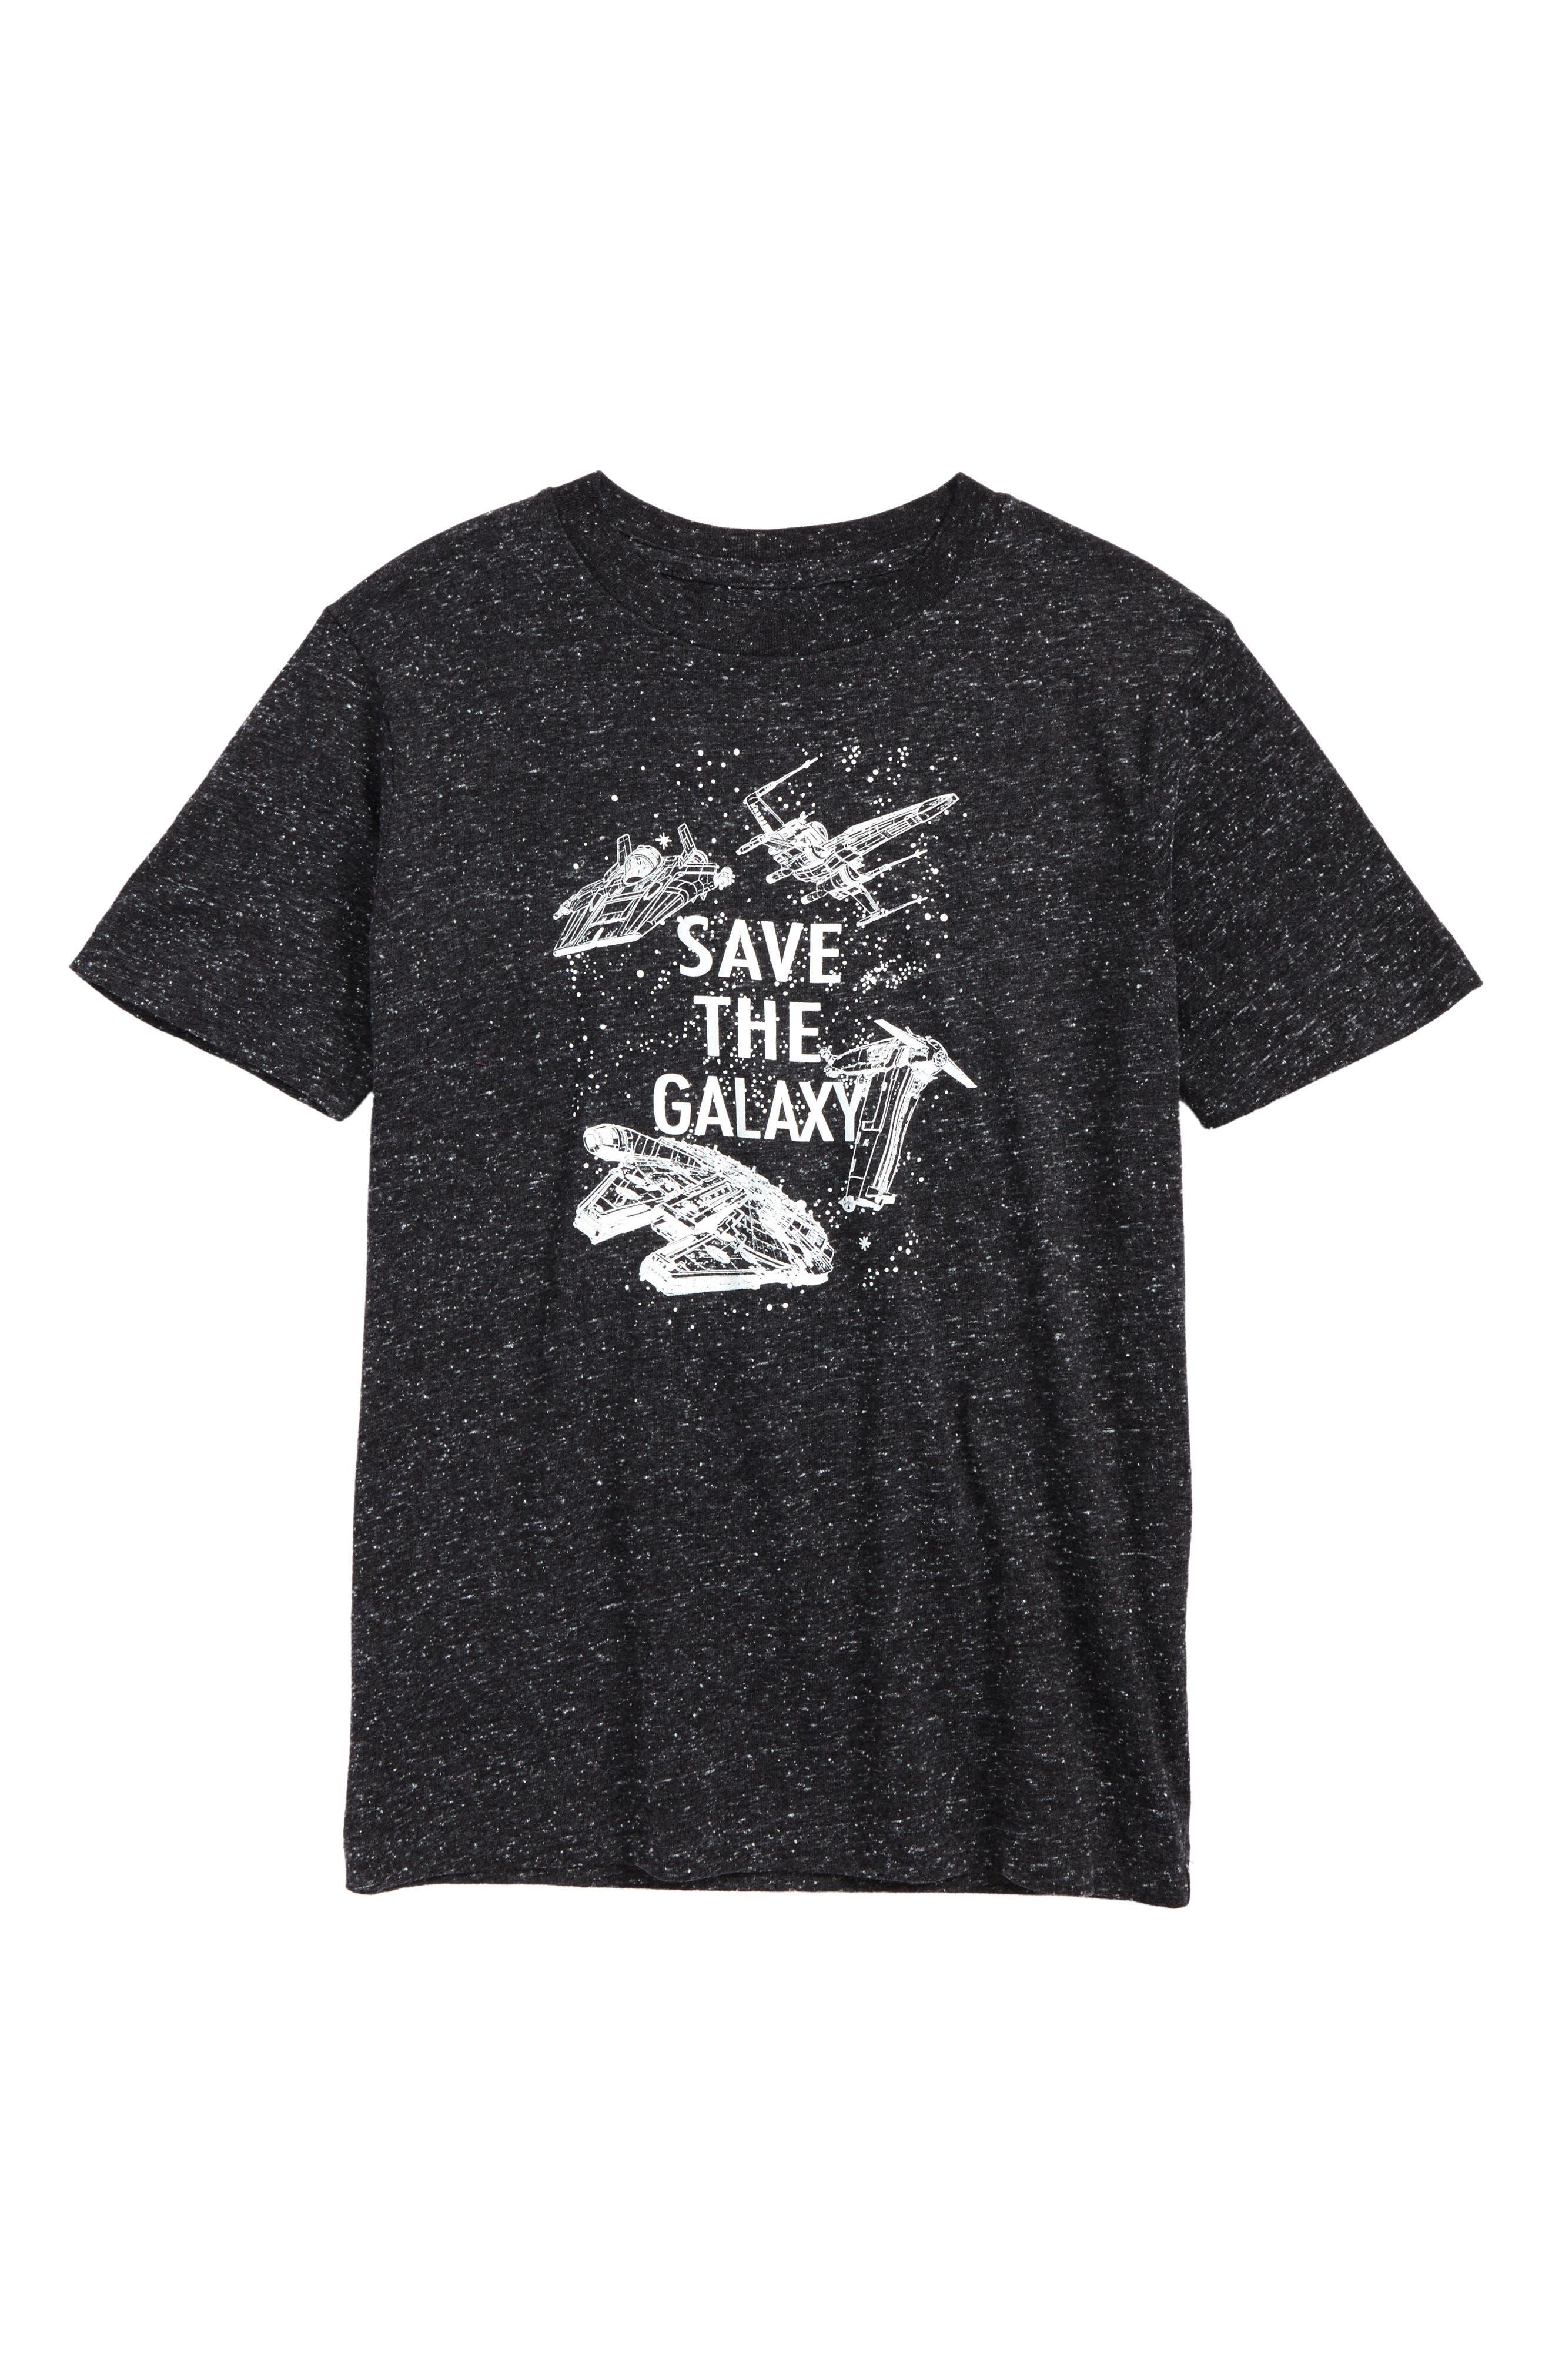 Main Image - Jem Star Wars - Save the Galaxy Glow in the Dark T-Shirt (Big Boys)